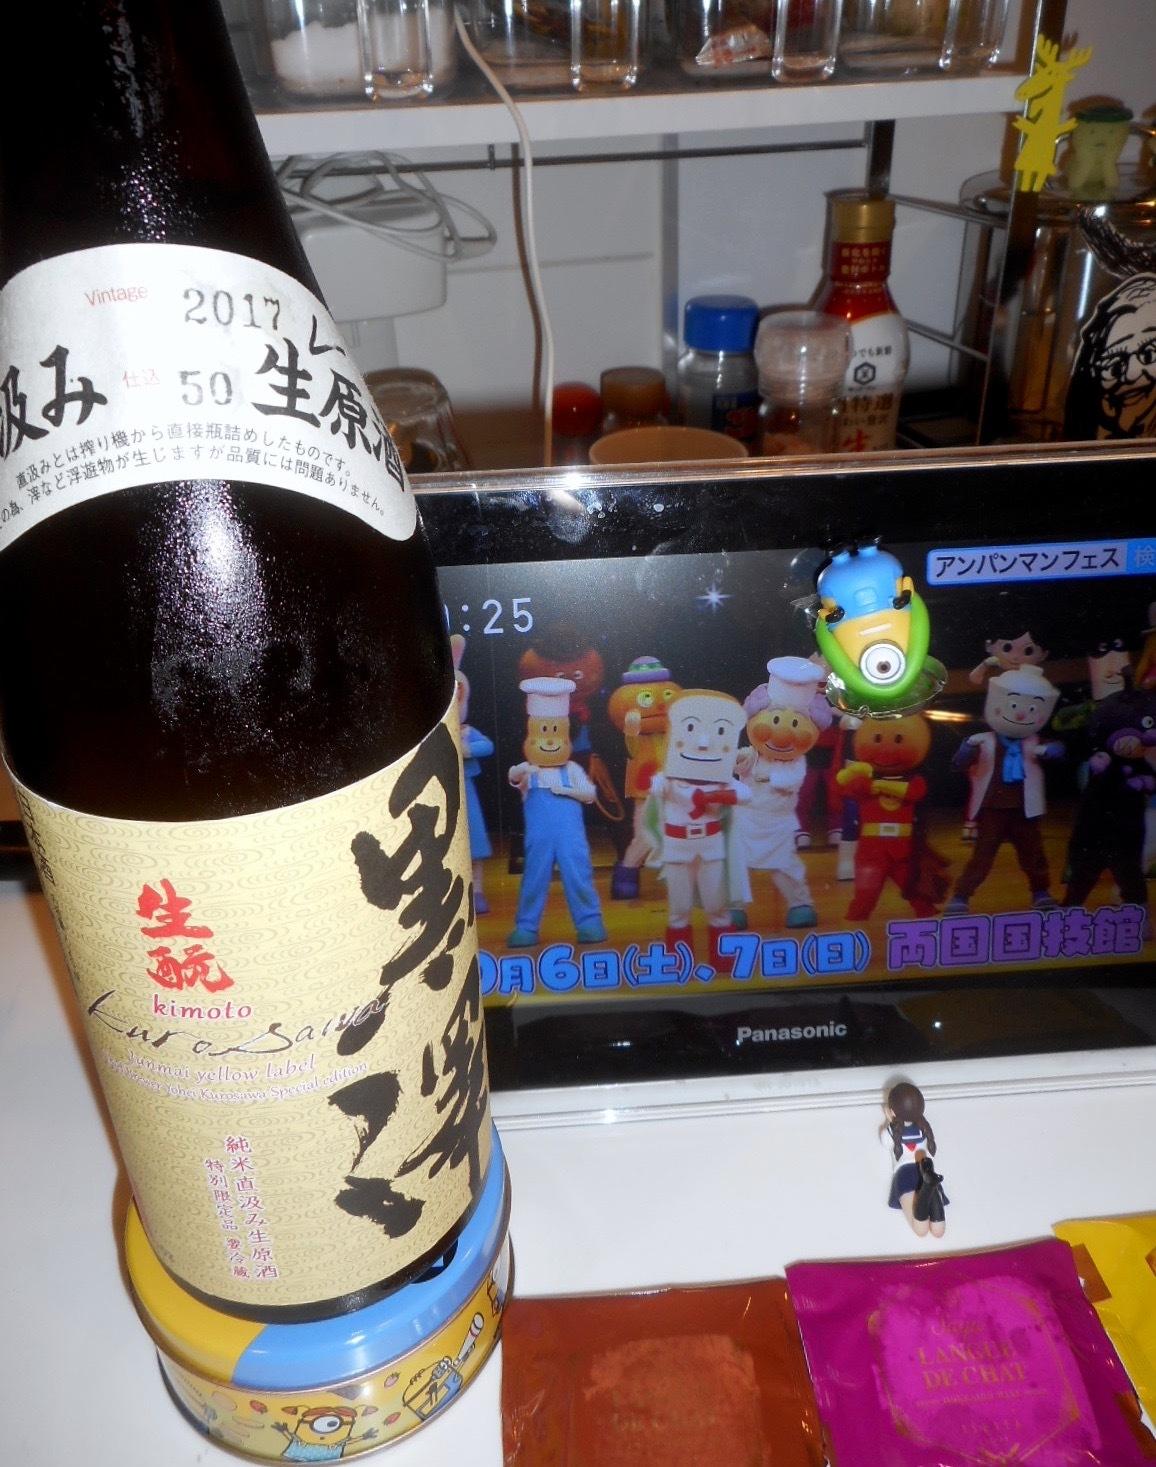 kurosawa_yellow29by2_2.jpg